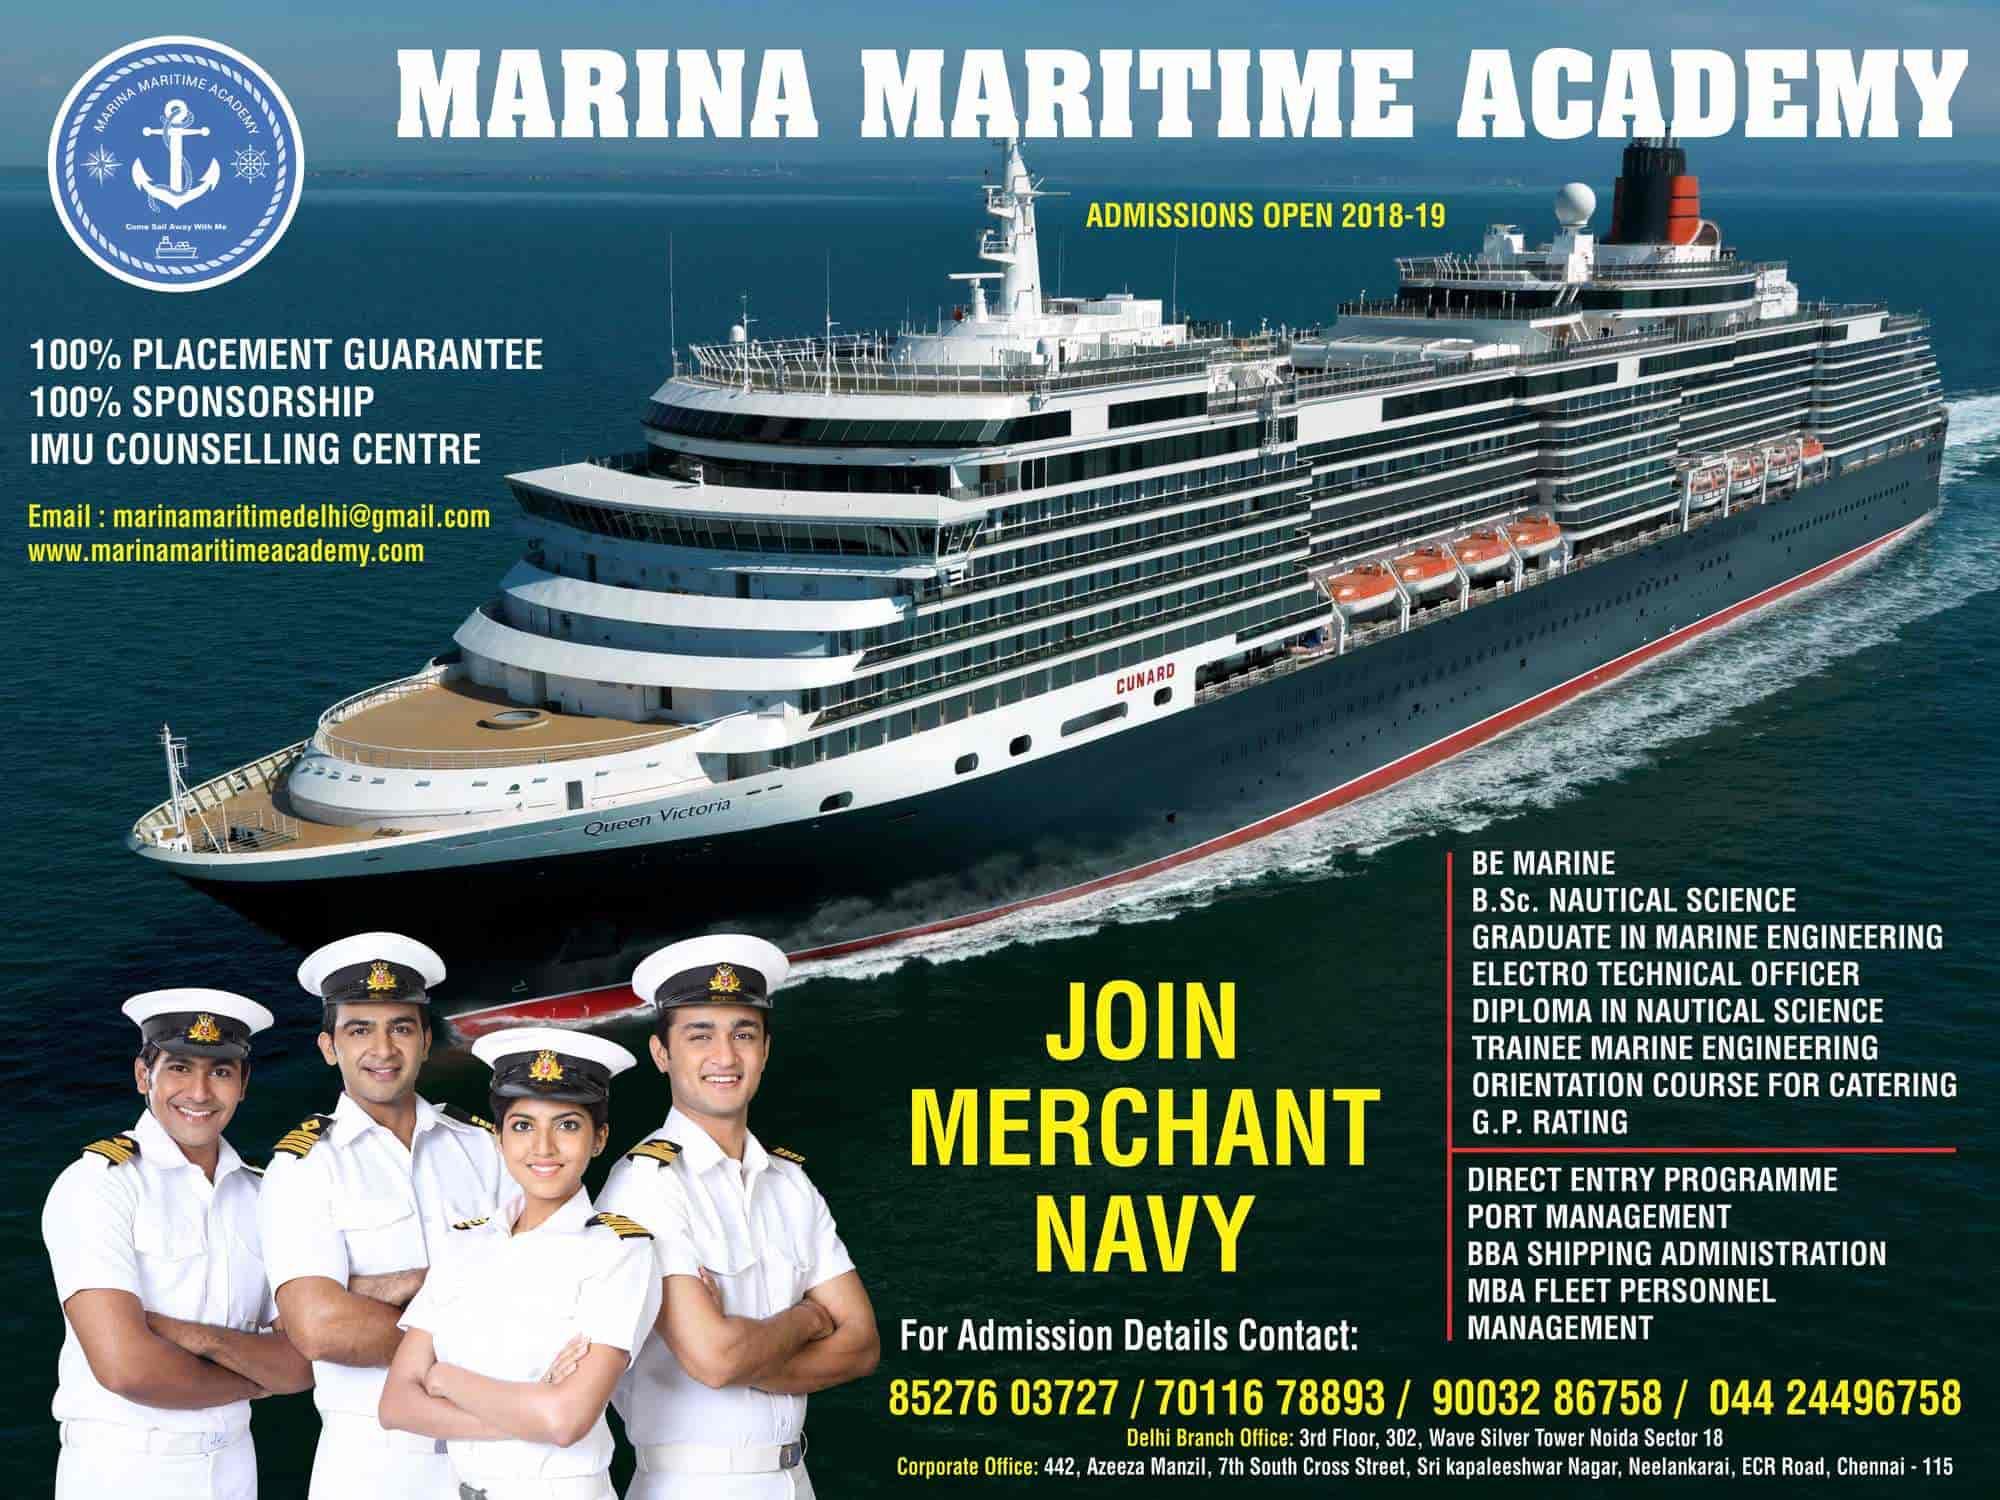 Marina Maritime Academy - Join Merchant Navy, Kankarbagh